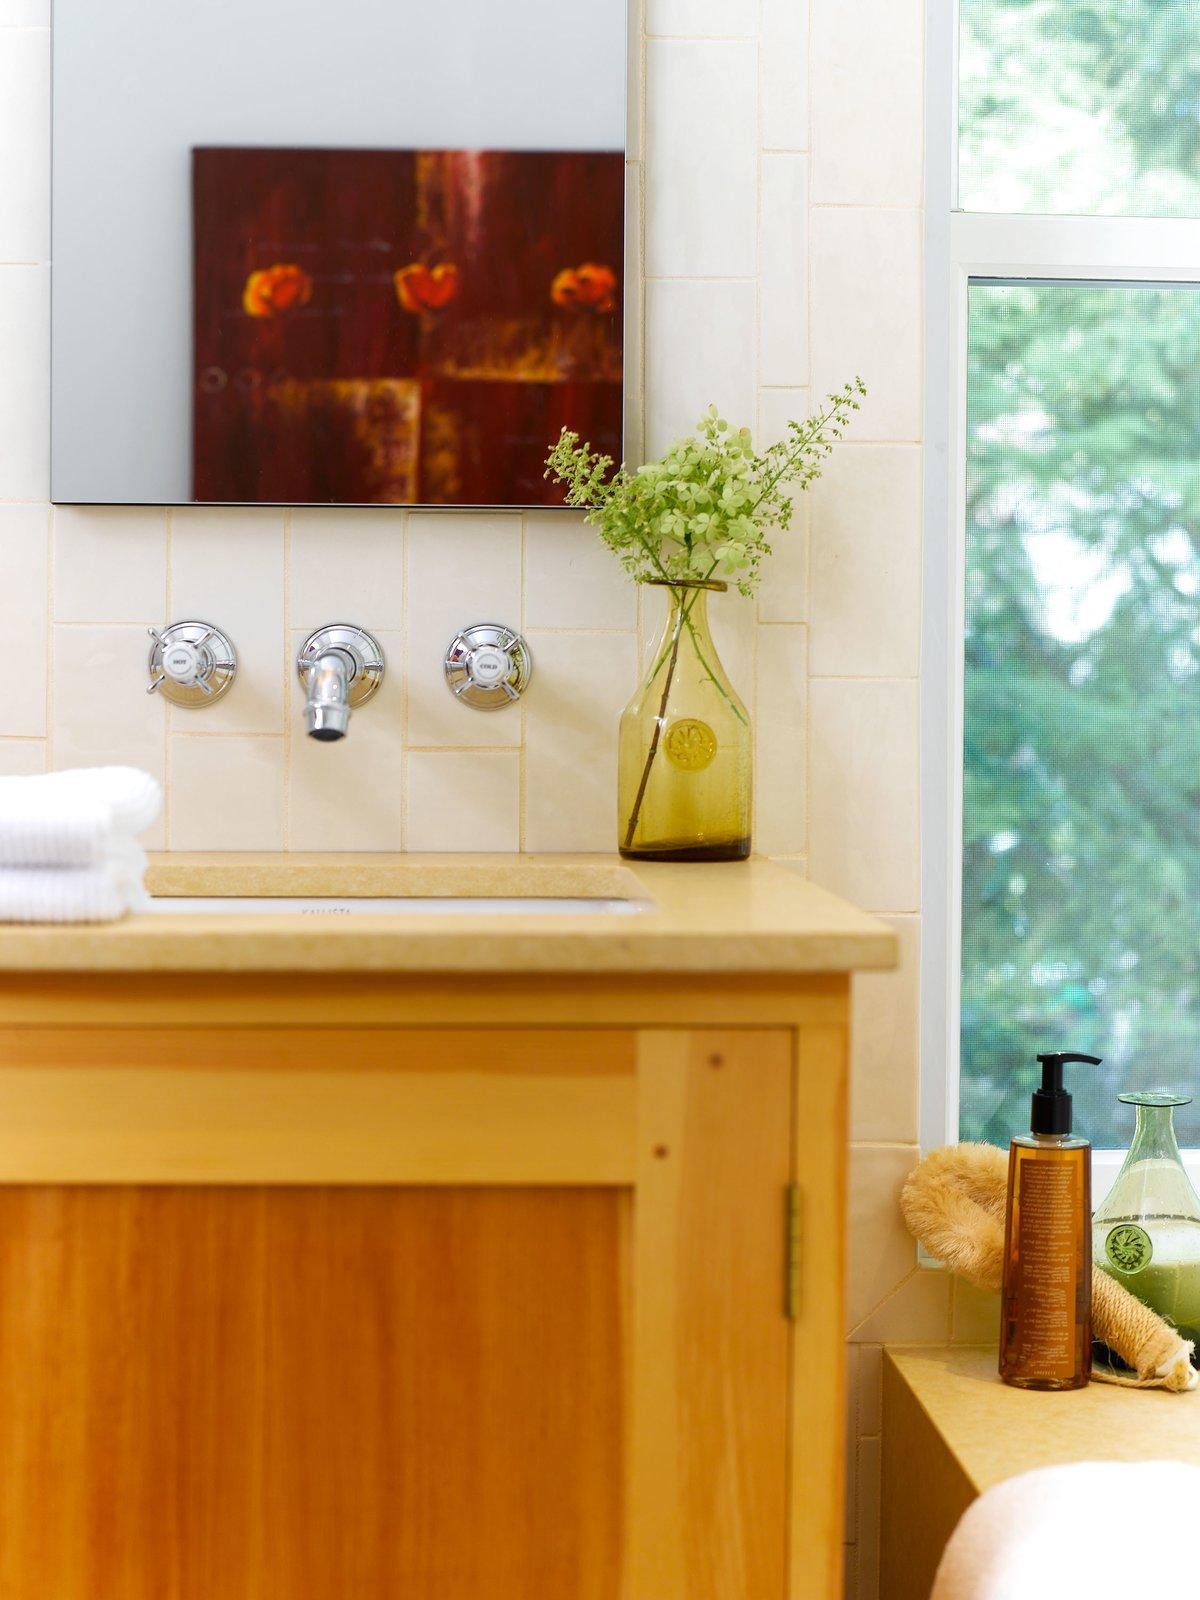 Bath Room, Undermount Sink, Porcelain Tile Wall, Undermount Tub, and Engineered Quartz Counter  Urban Farmhouse